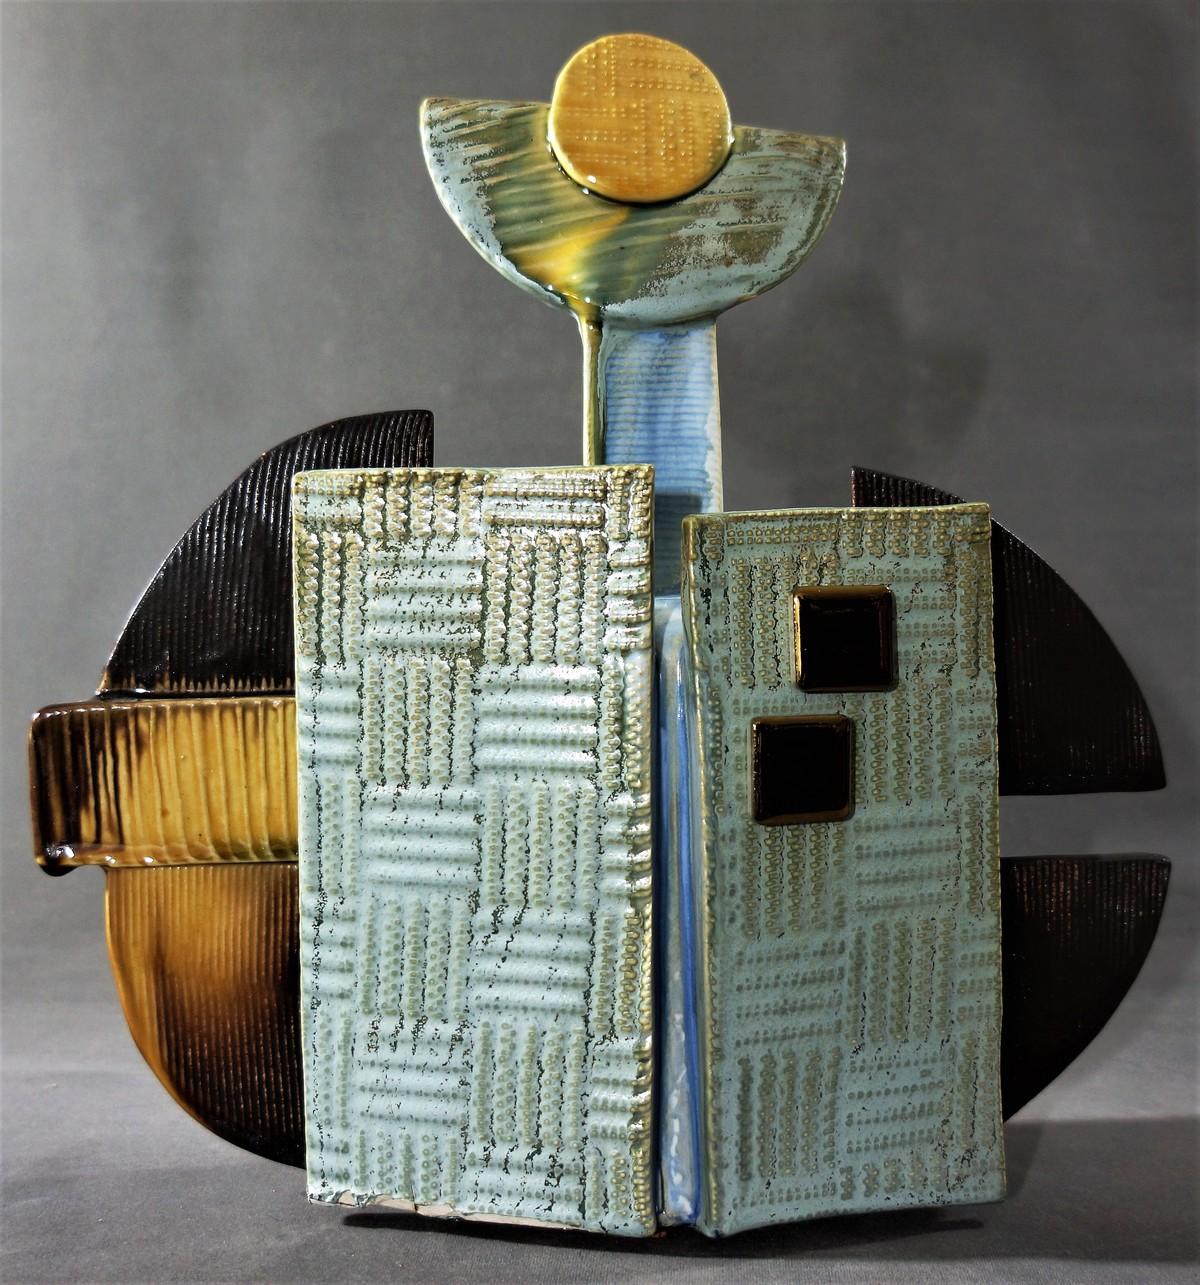 FRAGMENTS OF LIFE by Usha Garodia, Art Deco Sculpture | 3D, Ceramic, Gray color